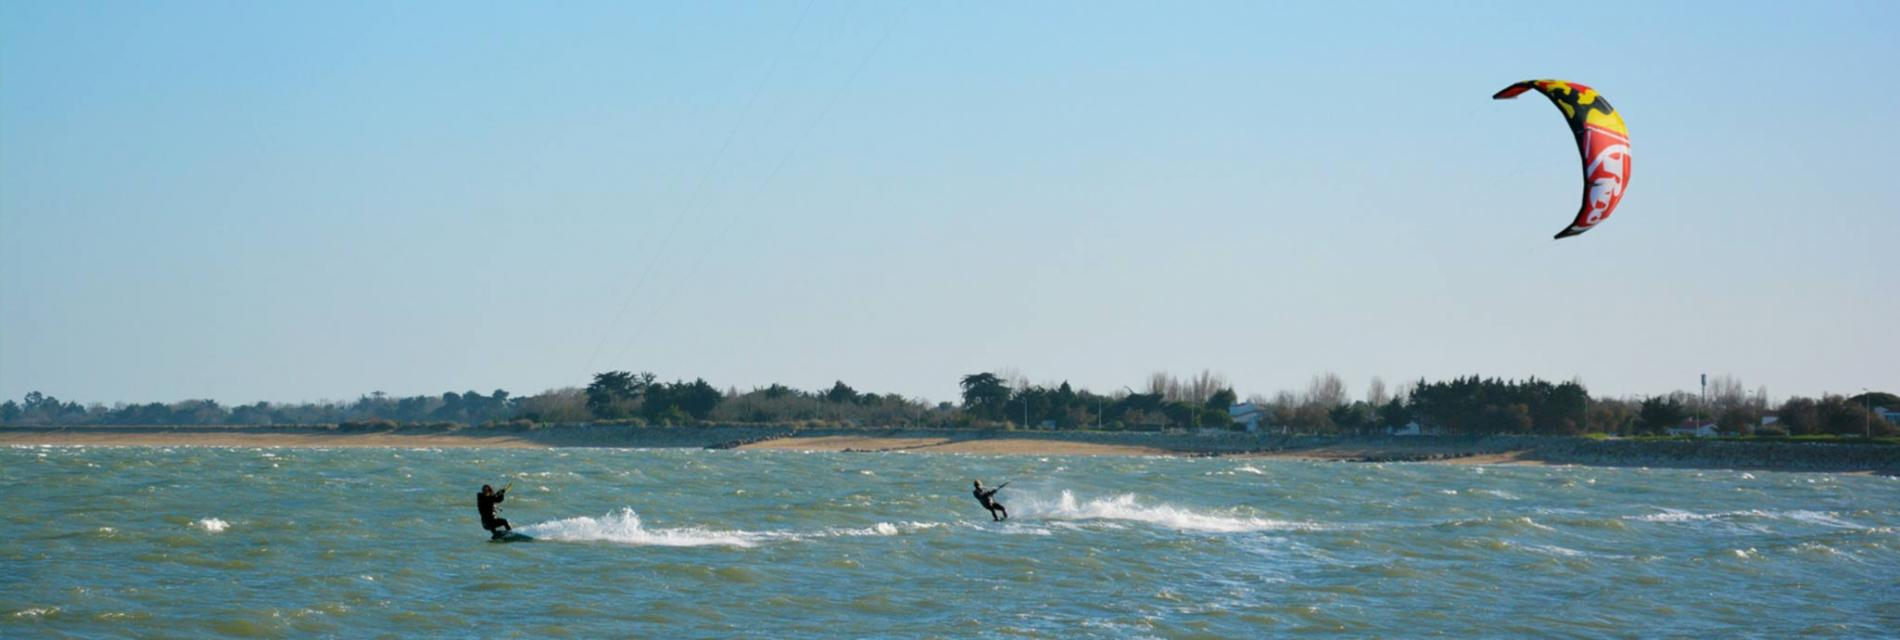 Slide sport nautique